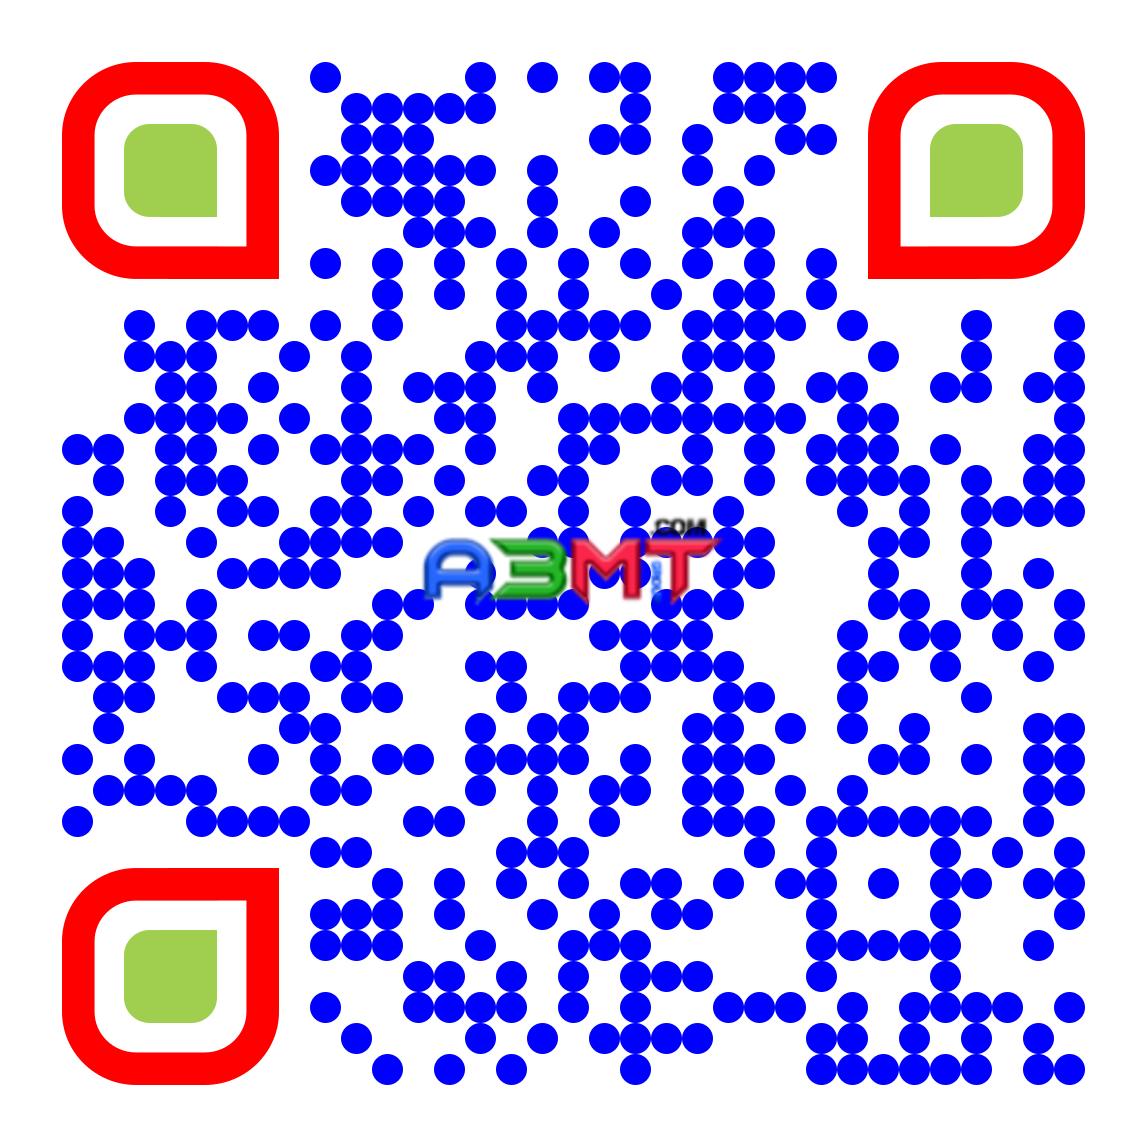 QR Code شبکه های کامپیوتری